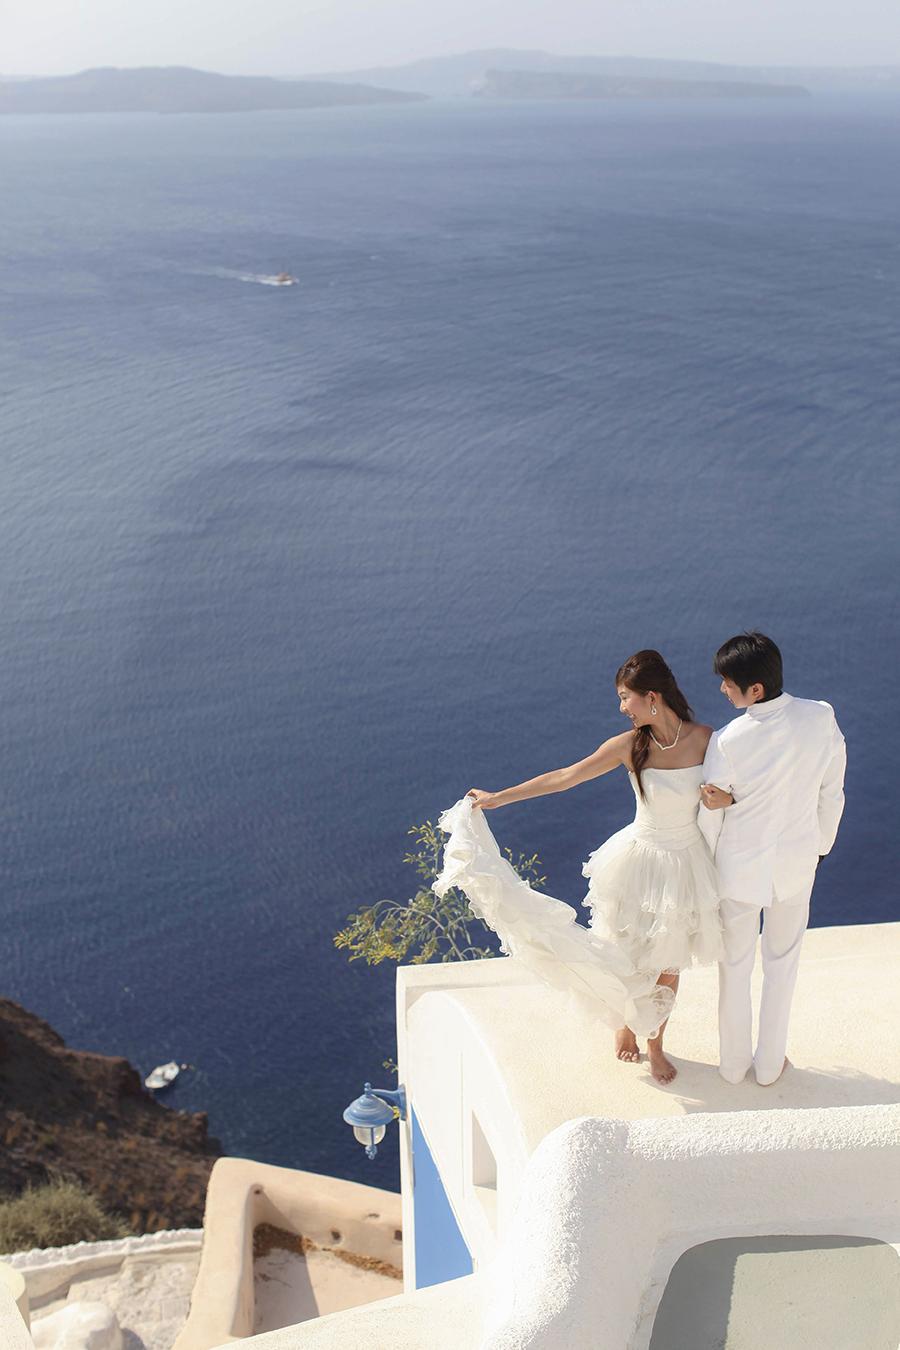 santorini greece . wedding photography by kurt ahs . 3089.jpg